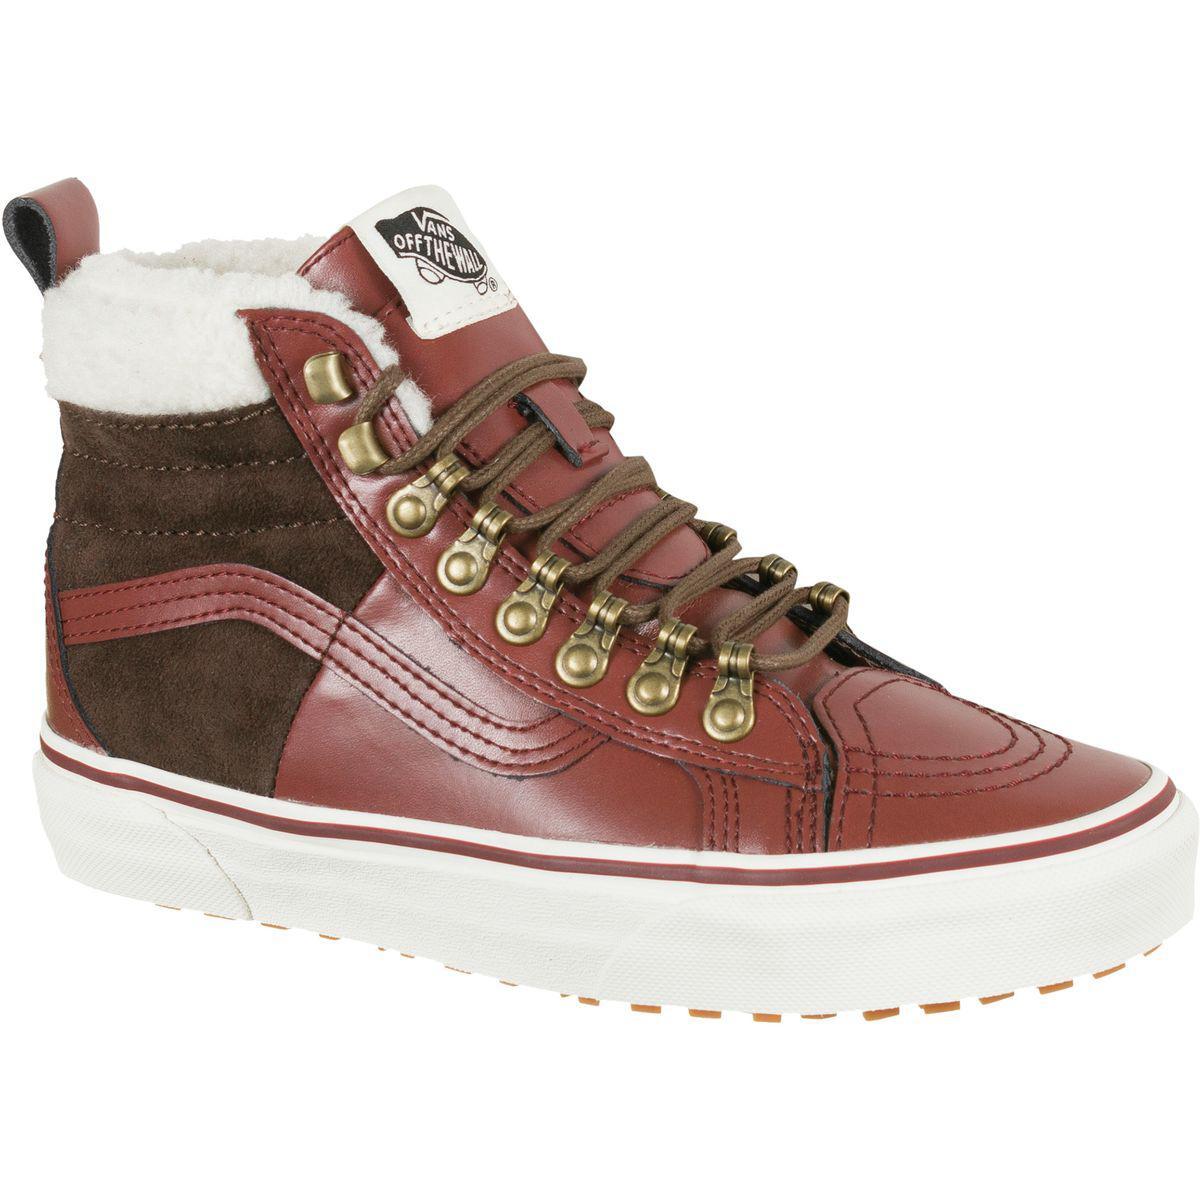 8e3820fd1723fa Lyst - Vans U Sk8-hi 46 Mte Dx Boot in Brown